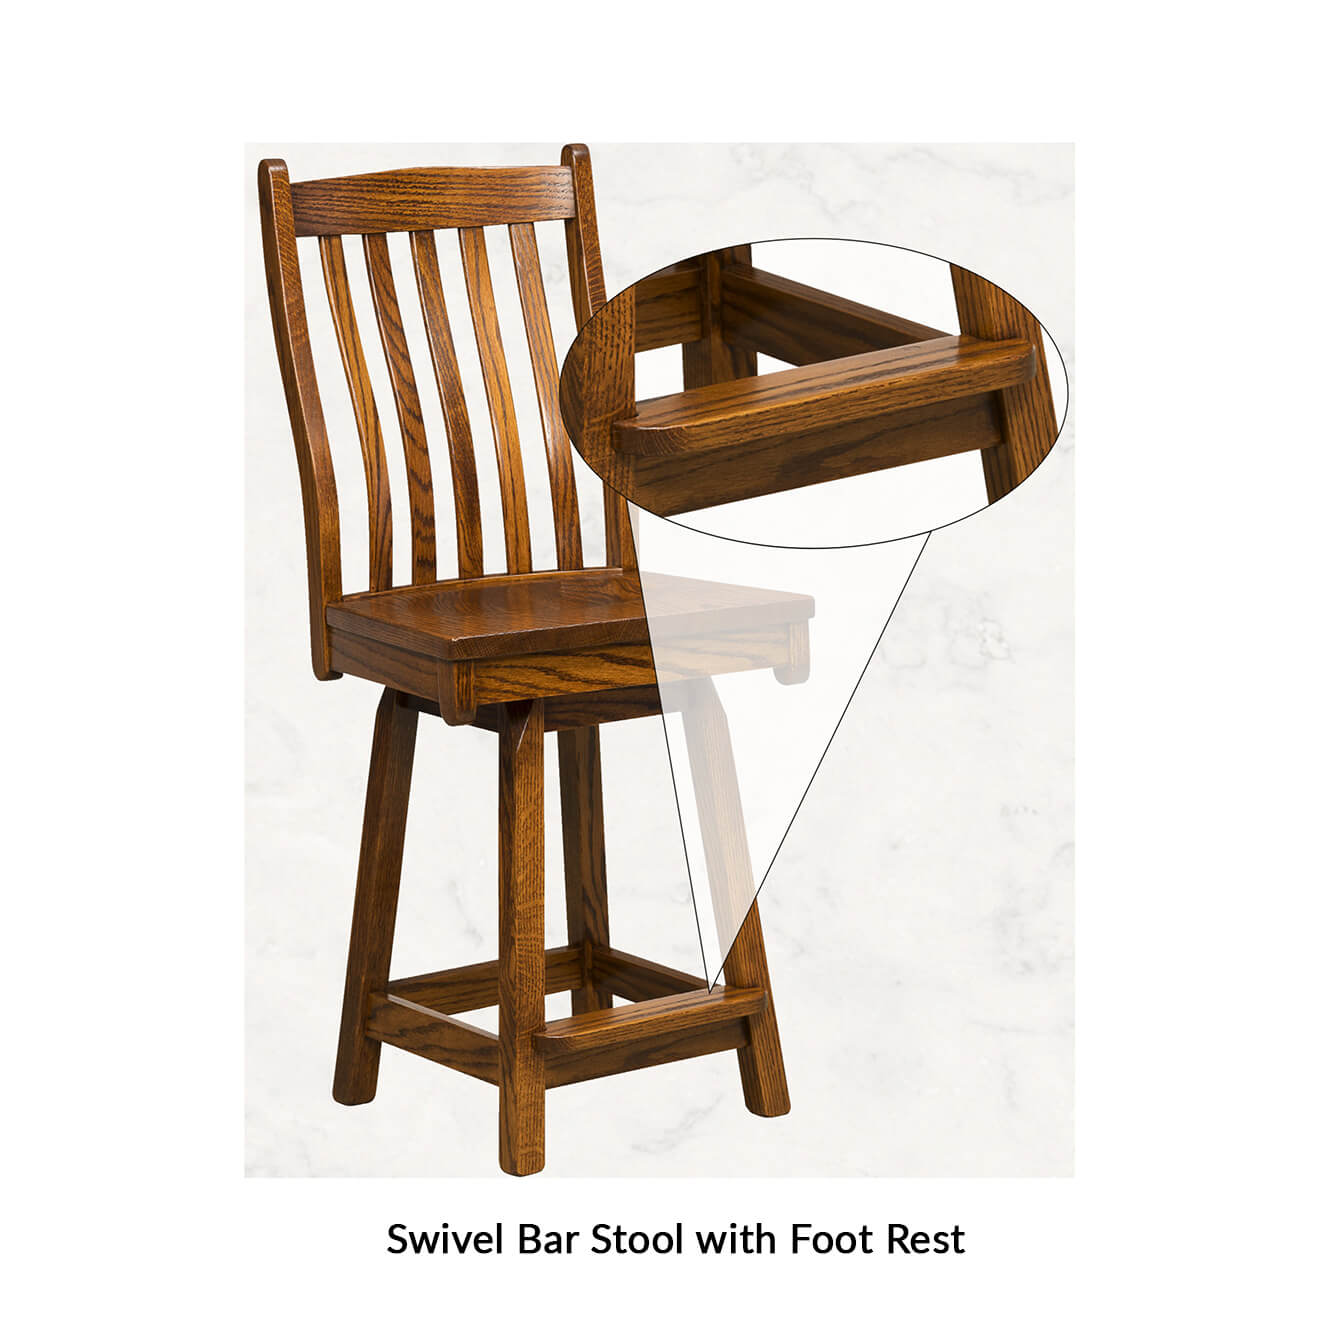 10.0-swivel-bar-stool-with-foot-rest.jpg